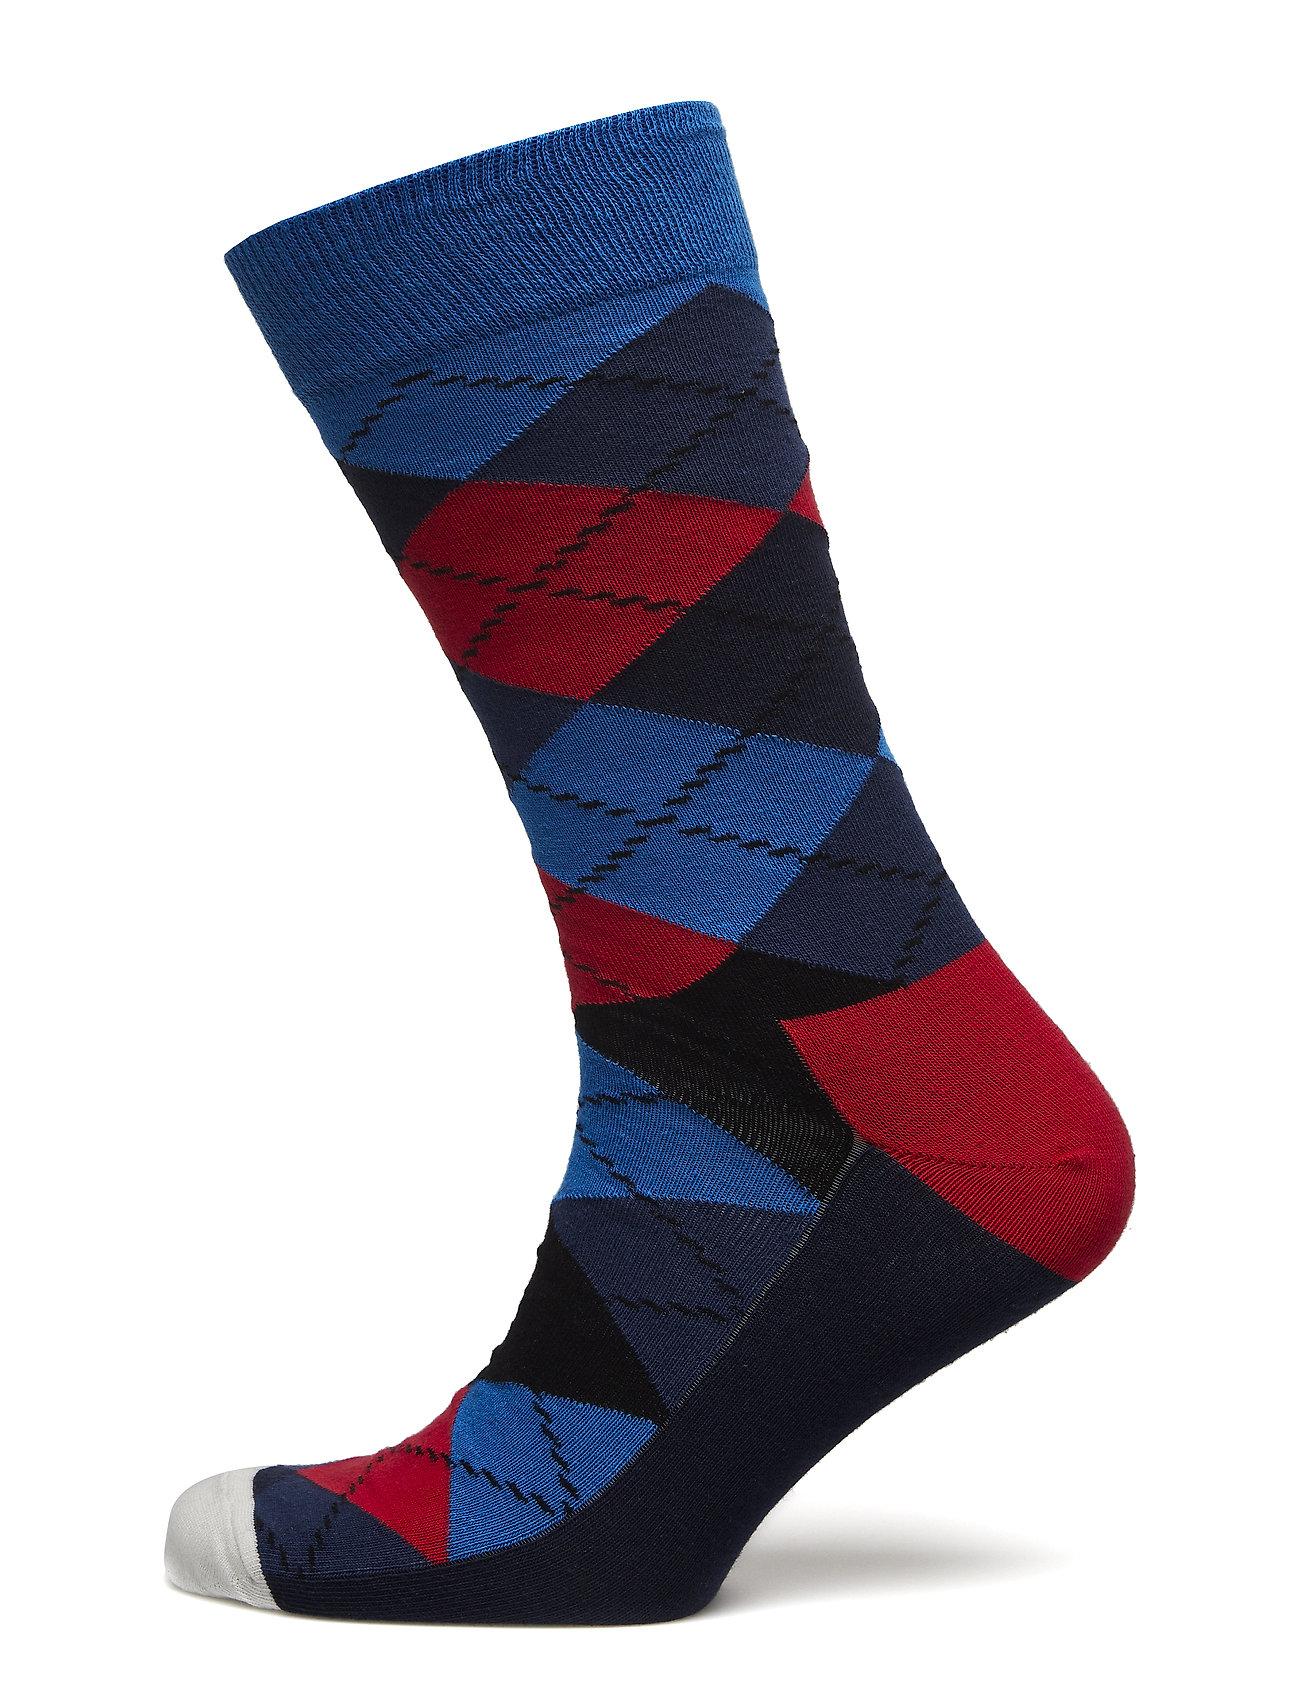 Happy Socks Argyle Sock - BLUE